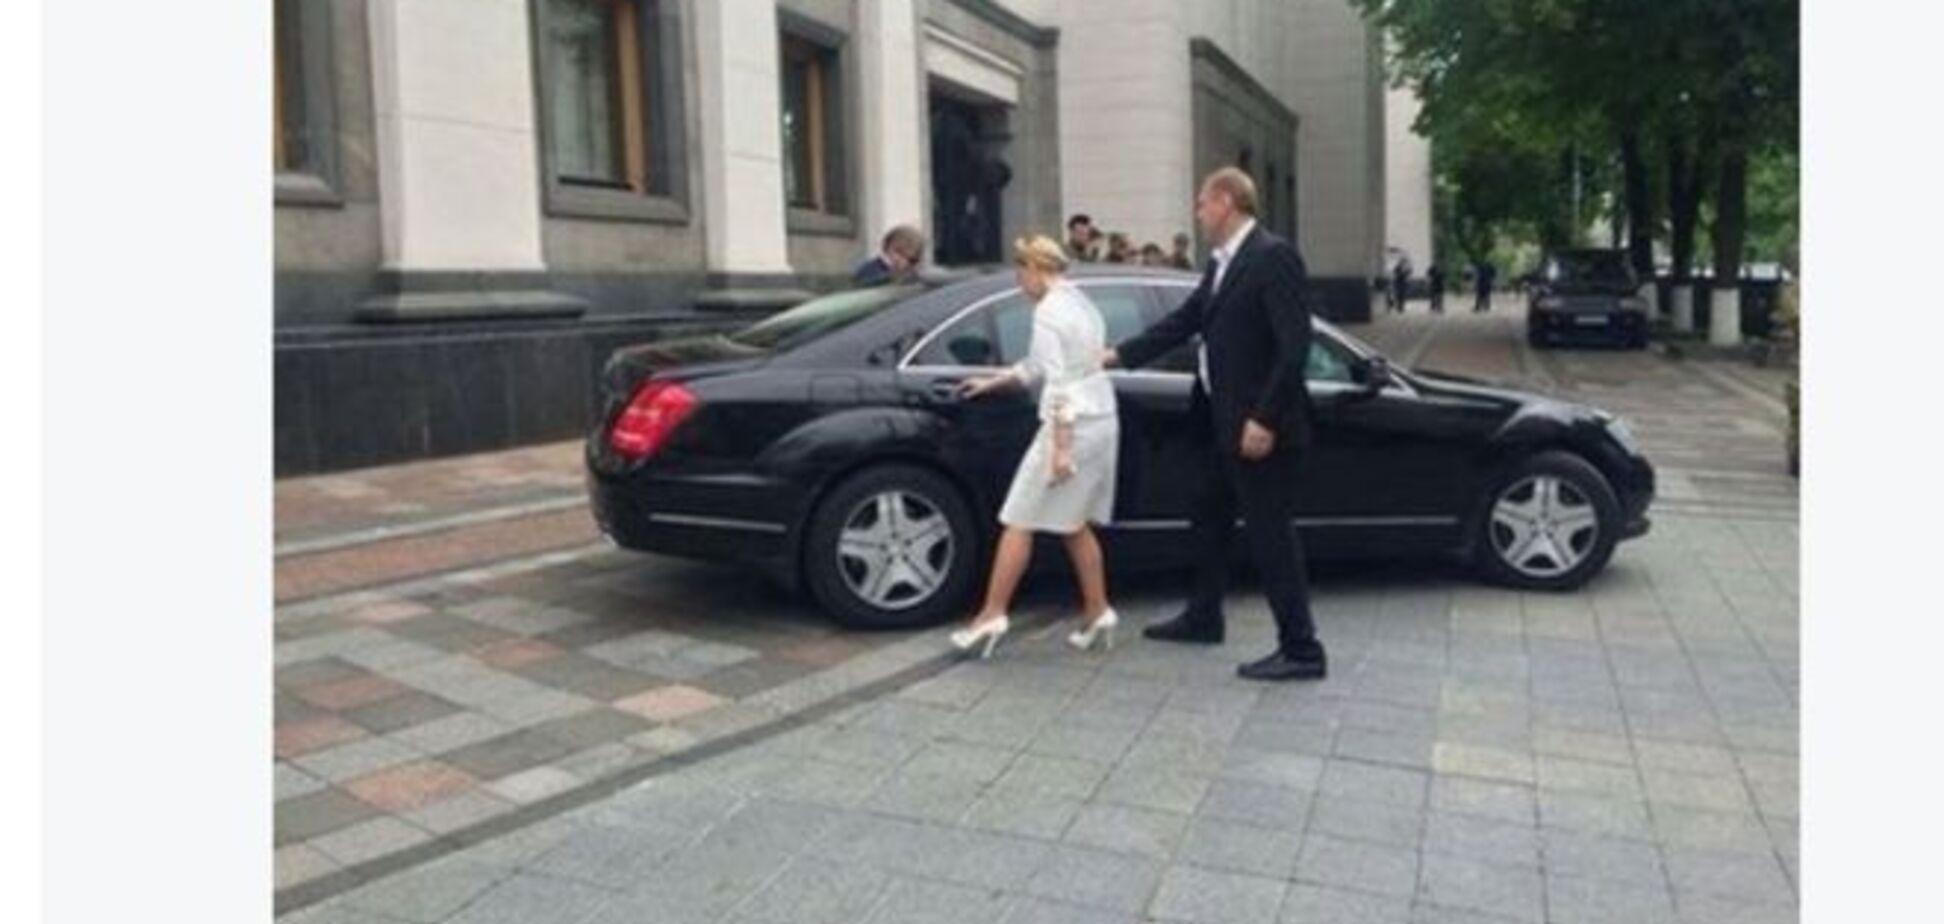 Жизнь Тимошенко: на коммуналку денег нет, но на Мерседес хватает